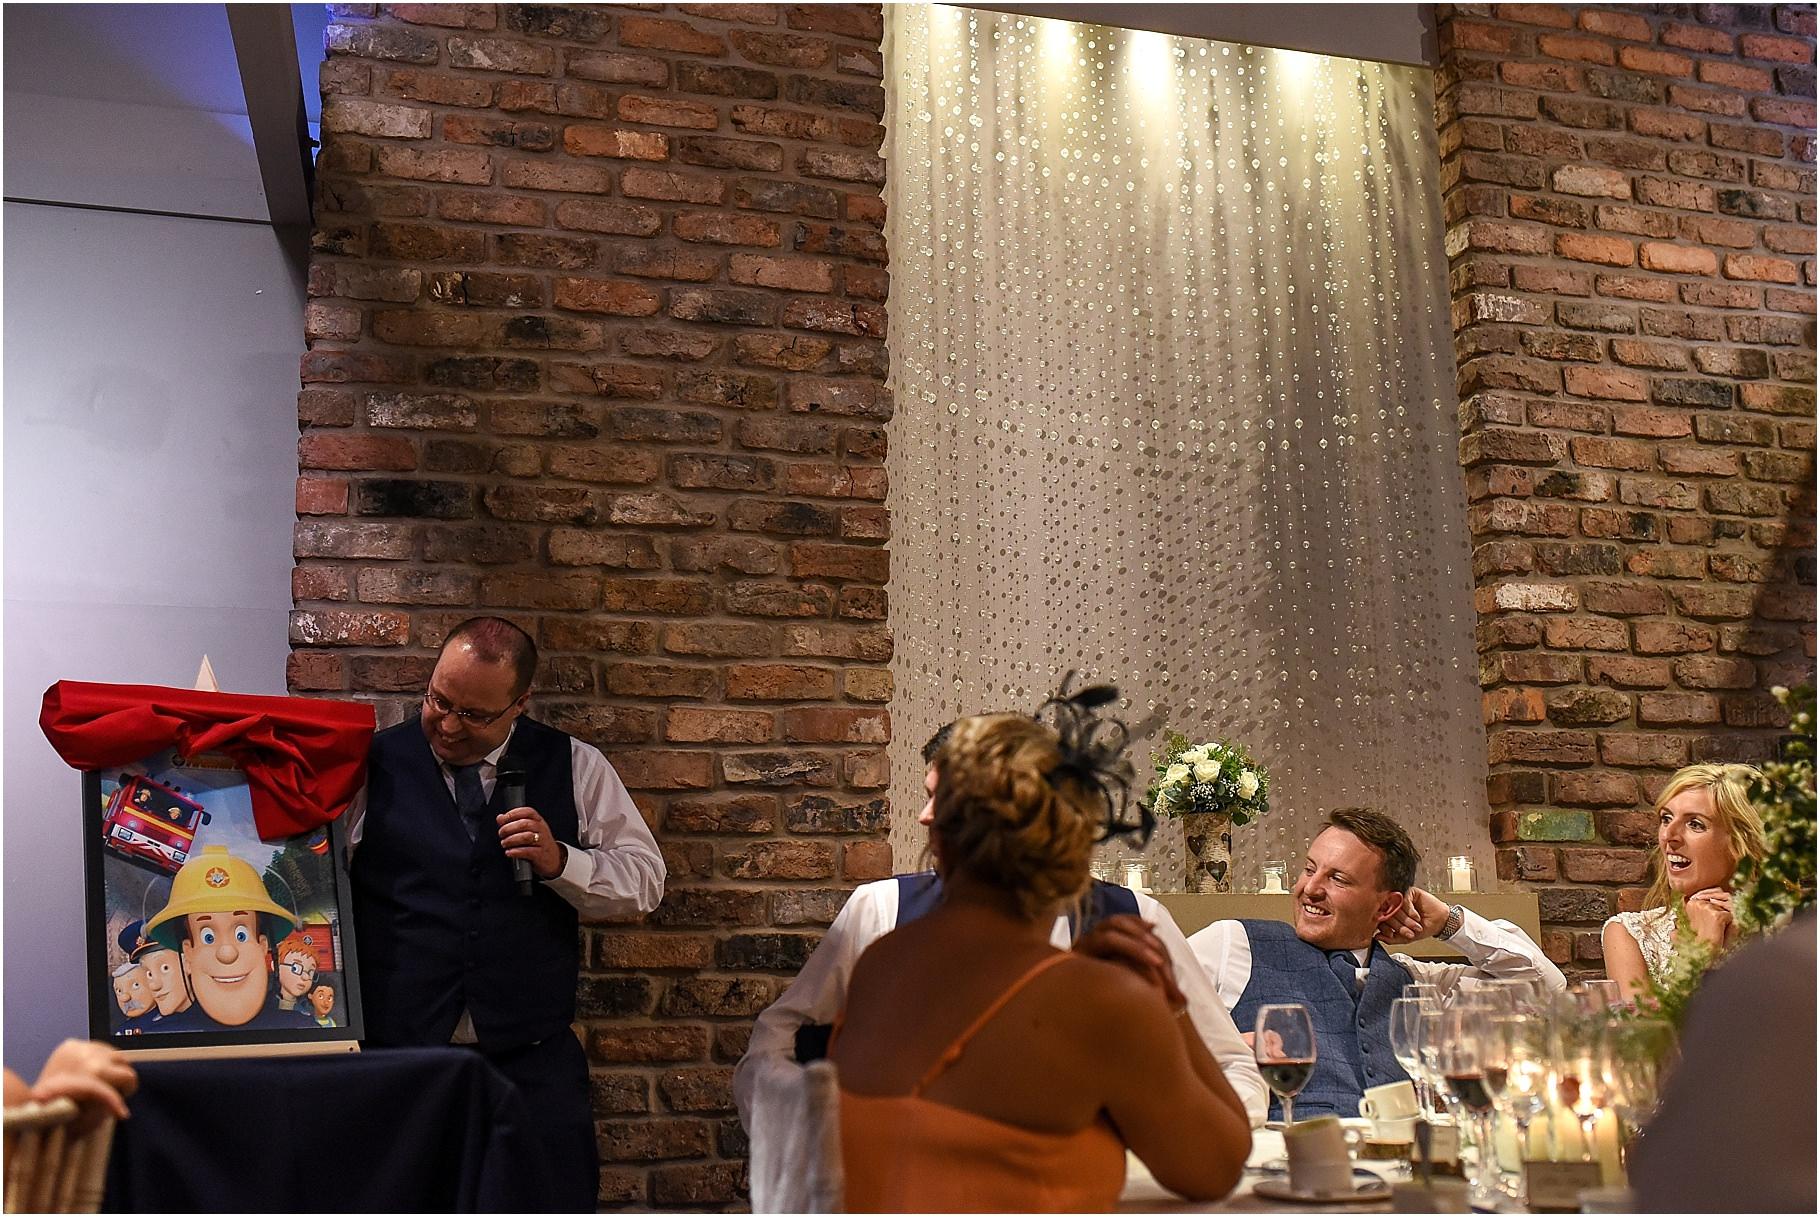 bartle-hall-wedding-photography-079.jpg